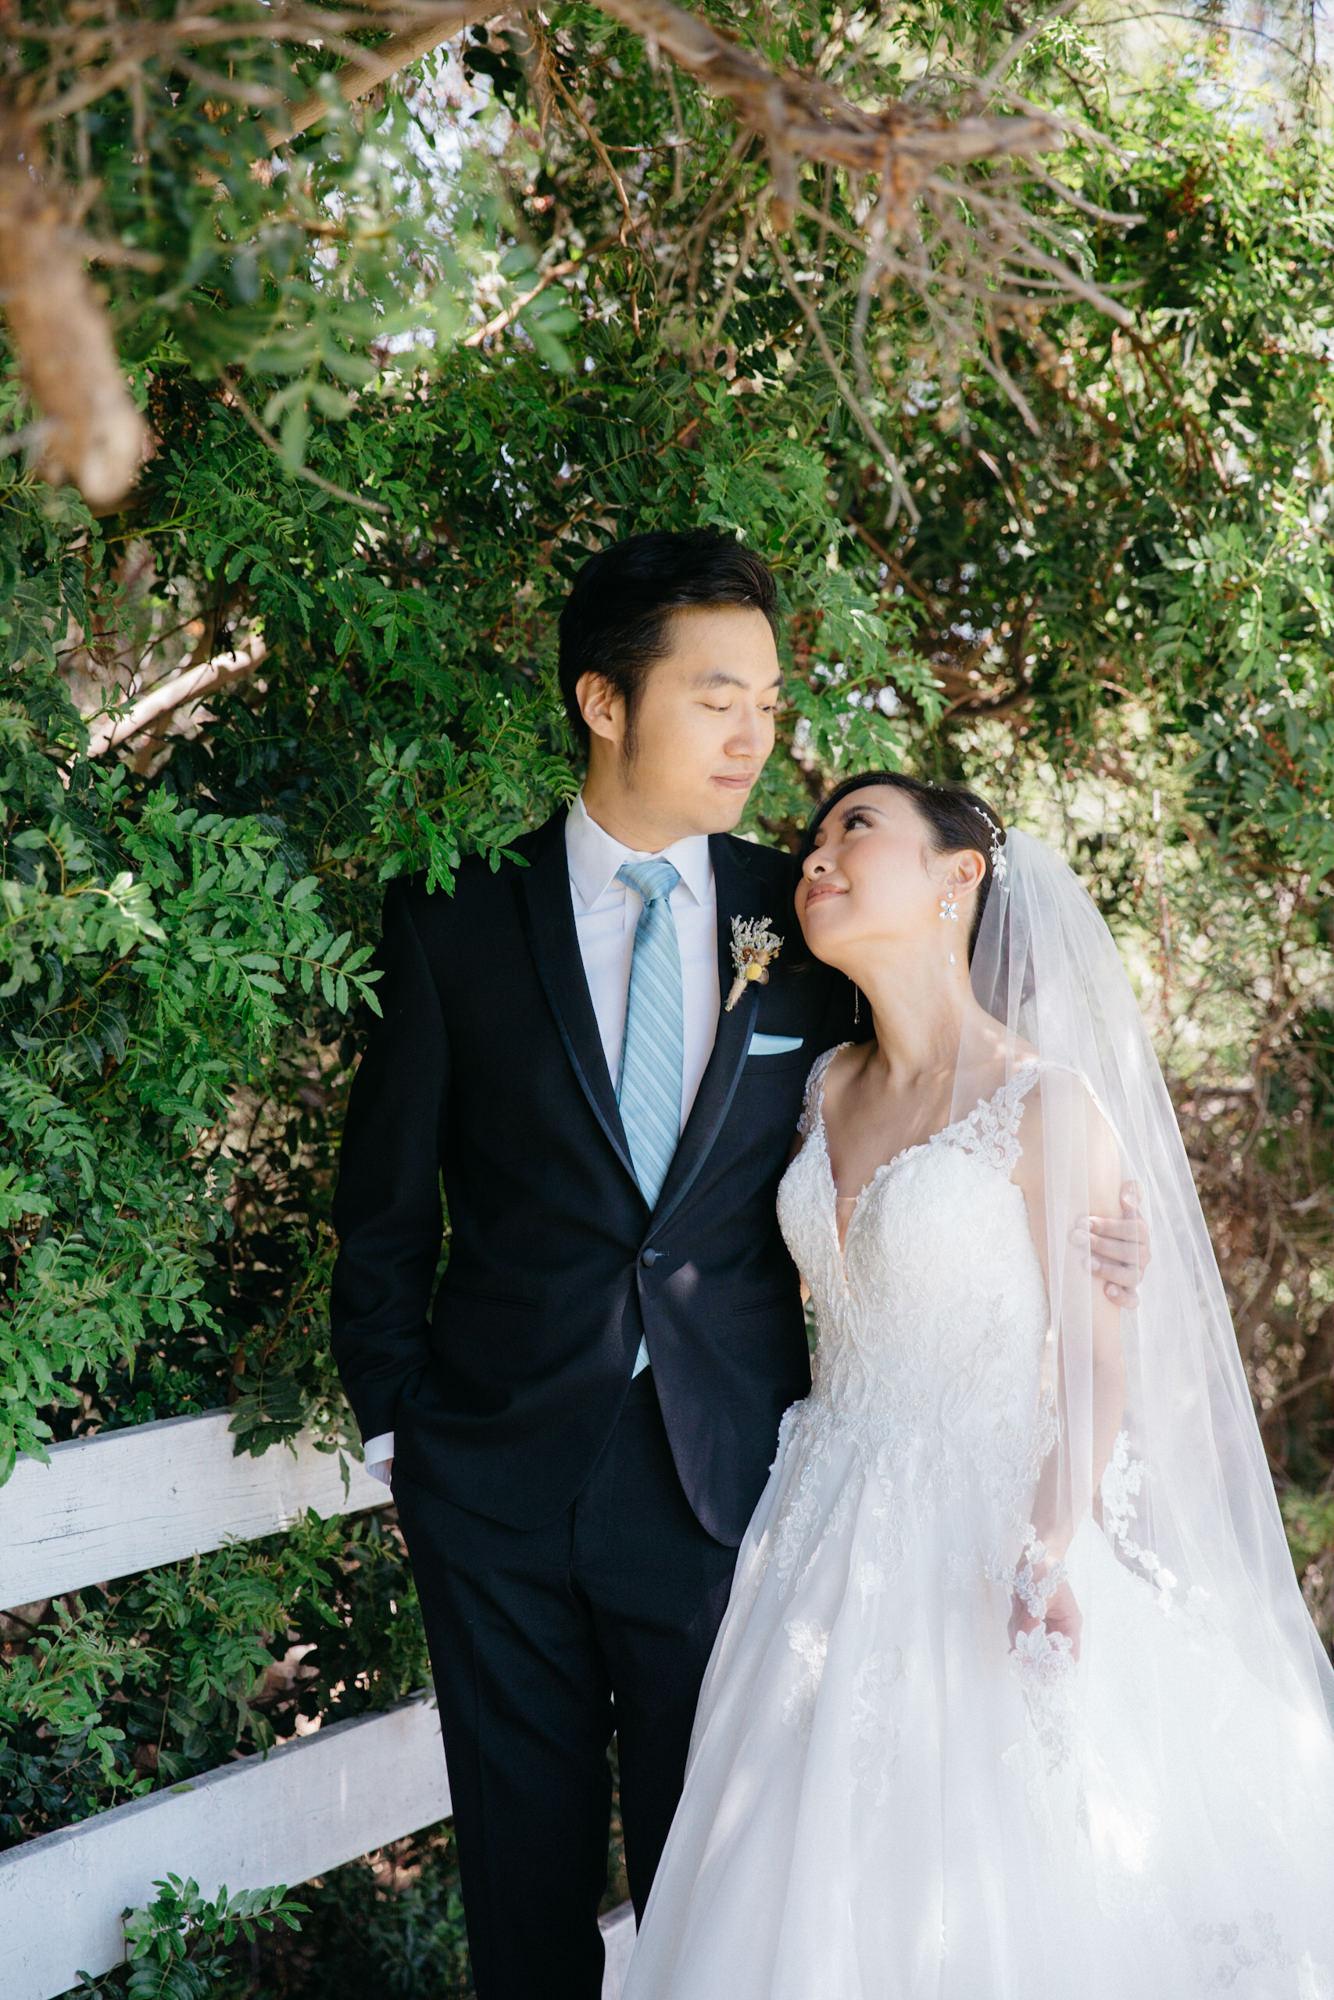 Tian and Cherry by Jenna Pangan-8.jpg